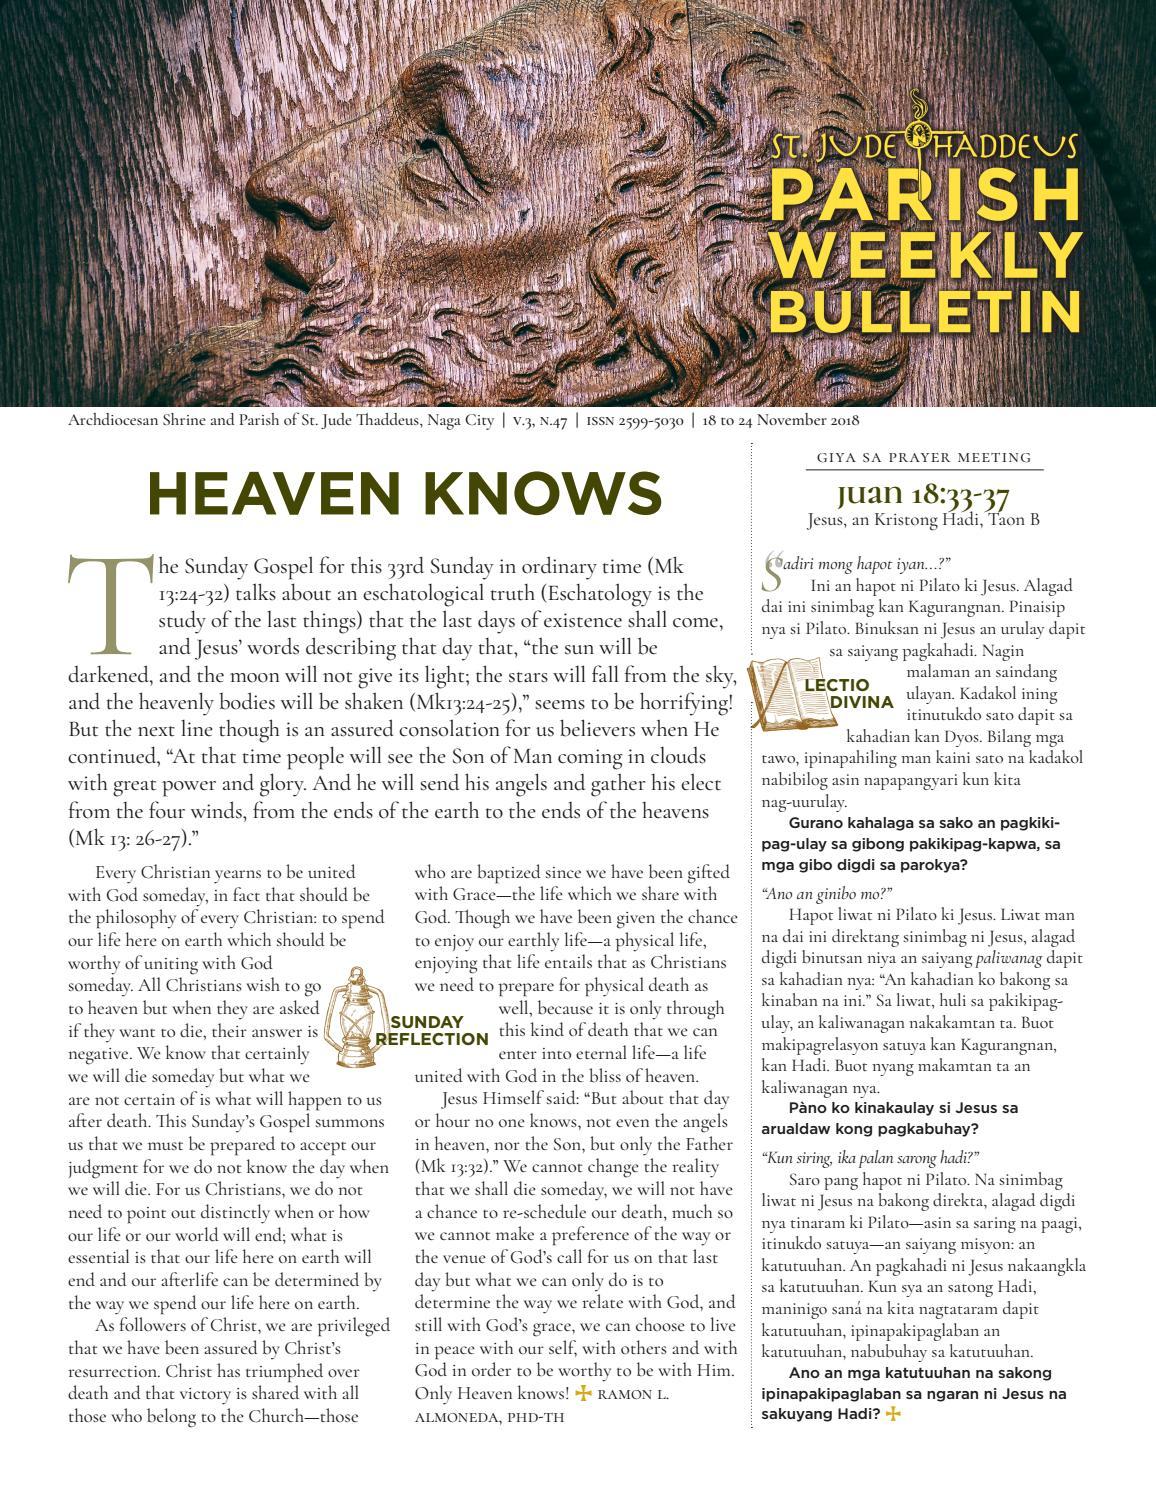 SJTP Parish Weekly Bulletin V3,N47 (November 18, 2018) by St